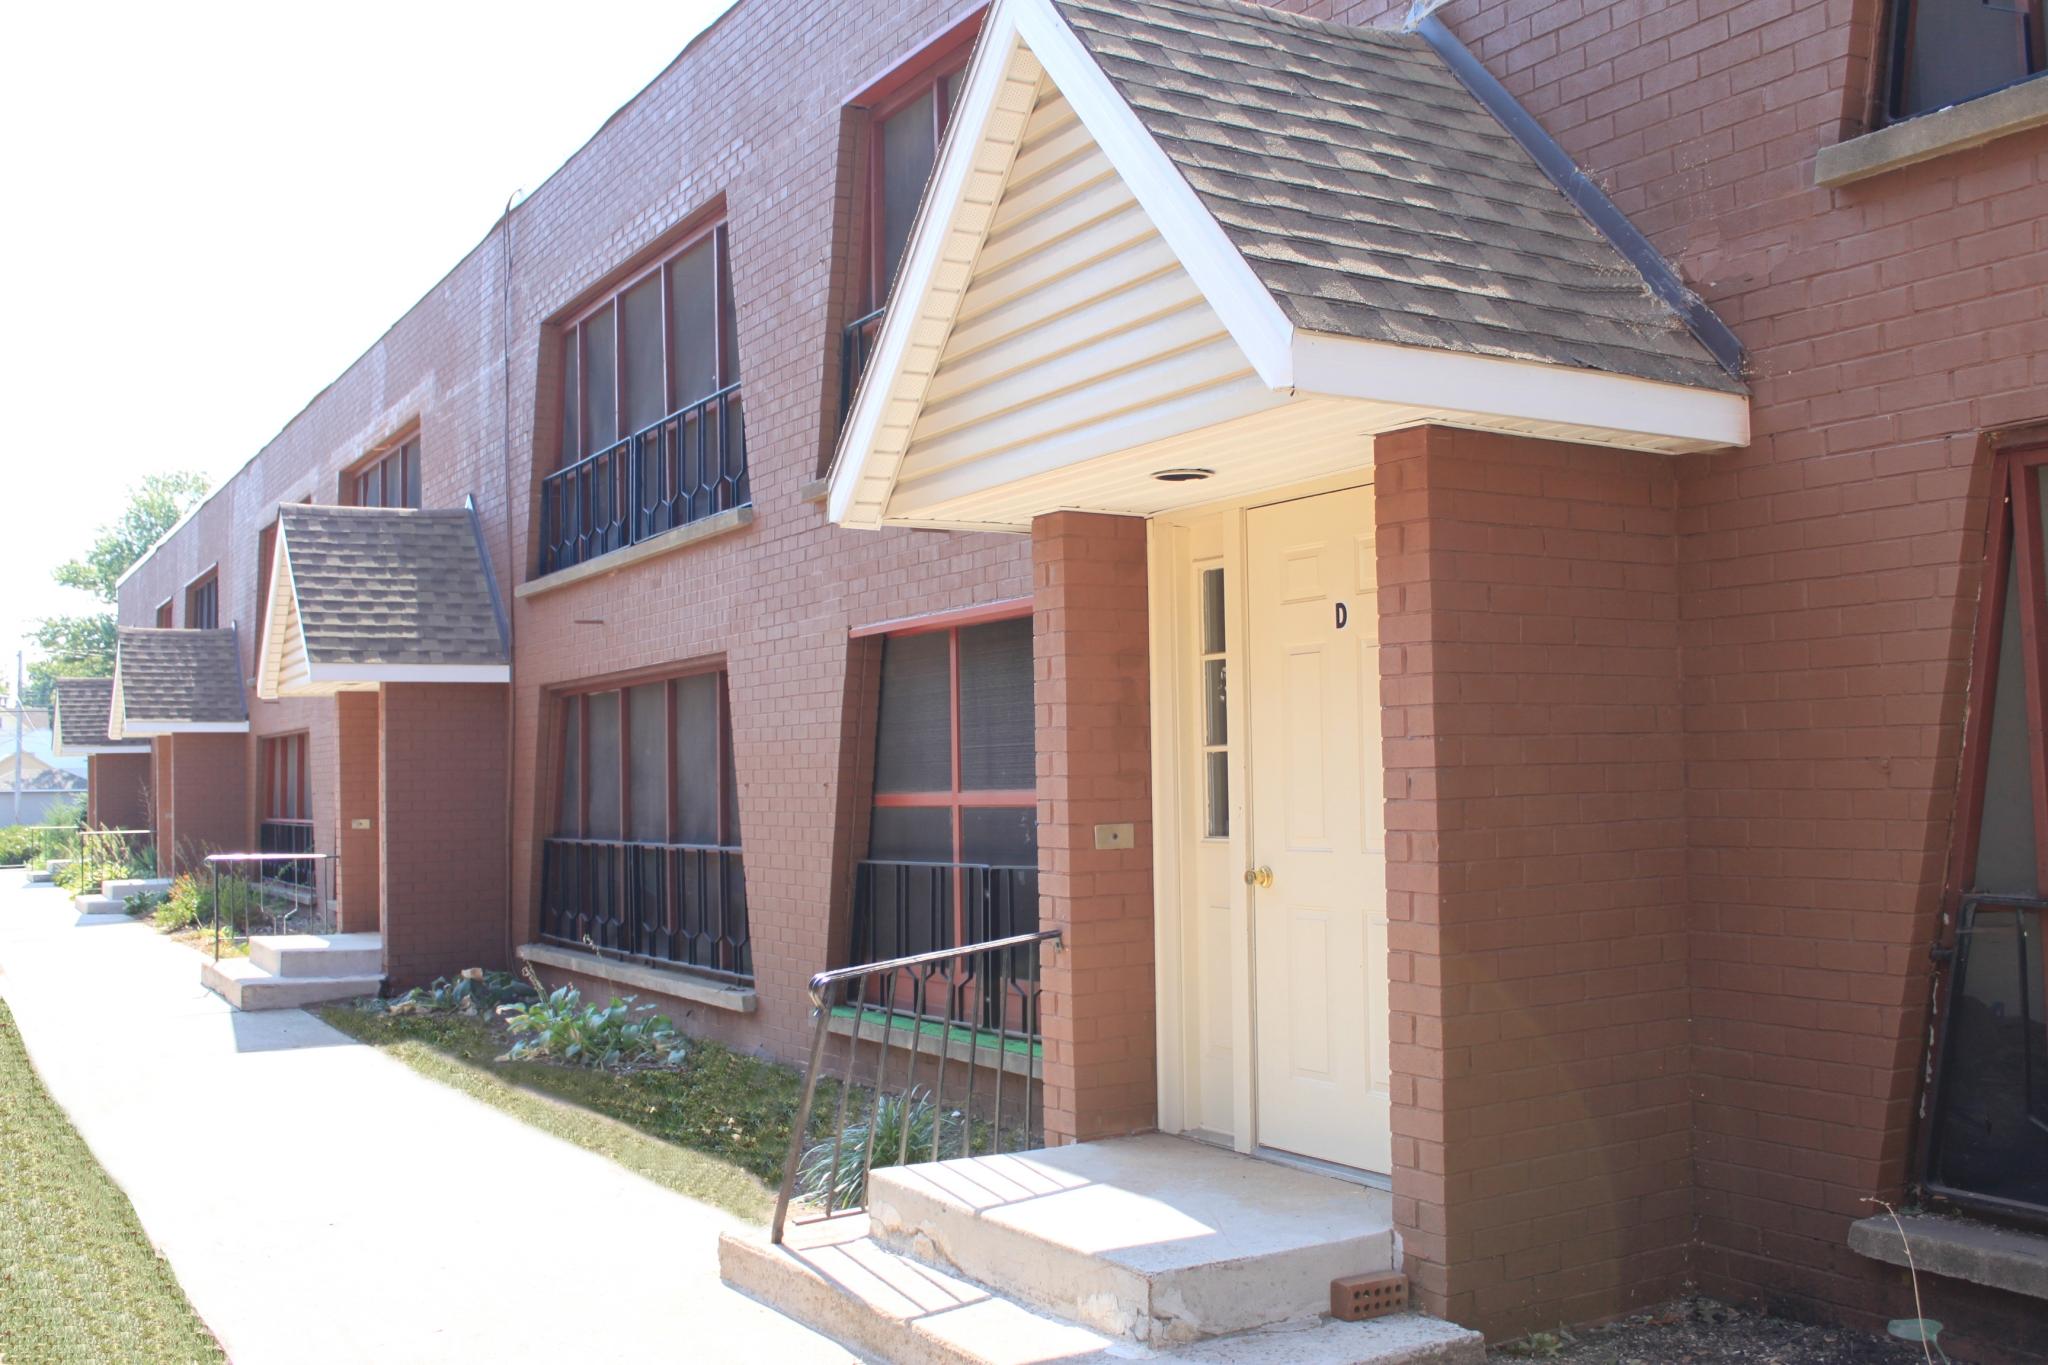 Lansdale Village Apartments image 2